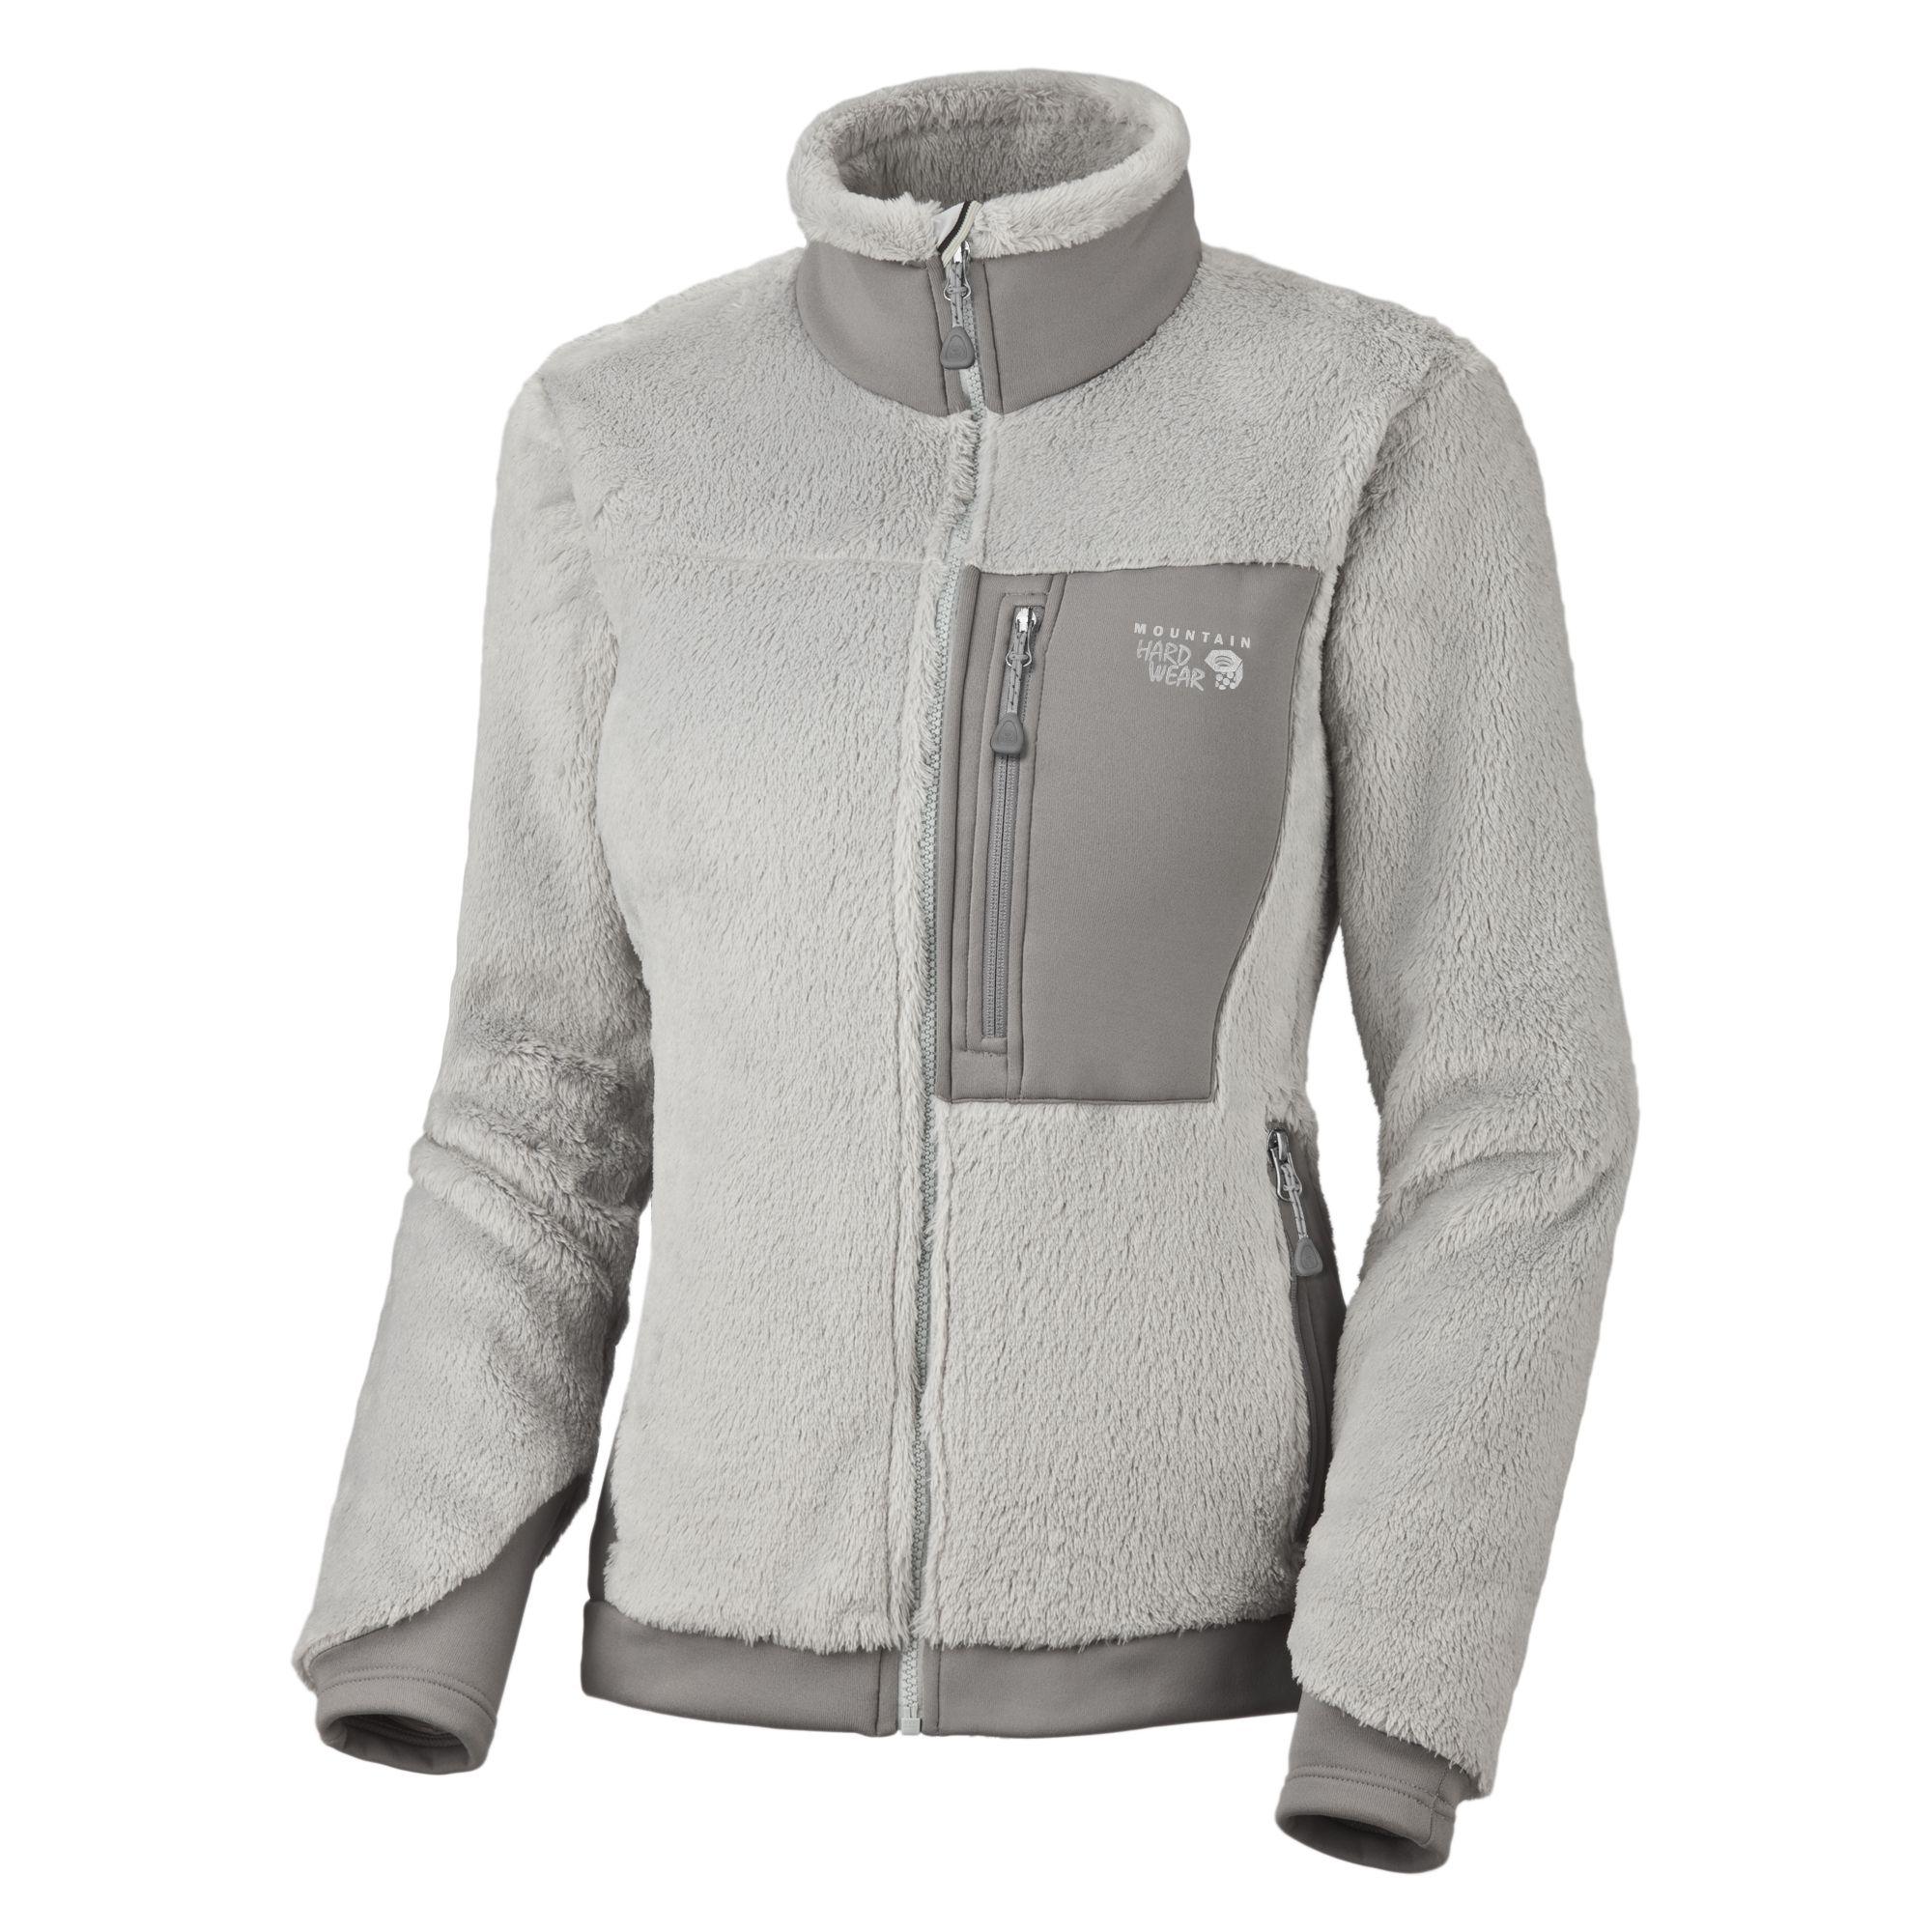 Cool grey/Stainless Mountain Hardwear women's Monkey mountain climbing  jacket.